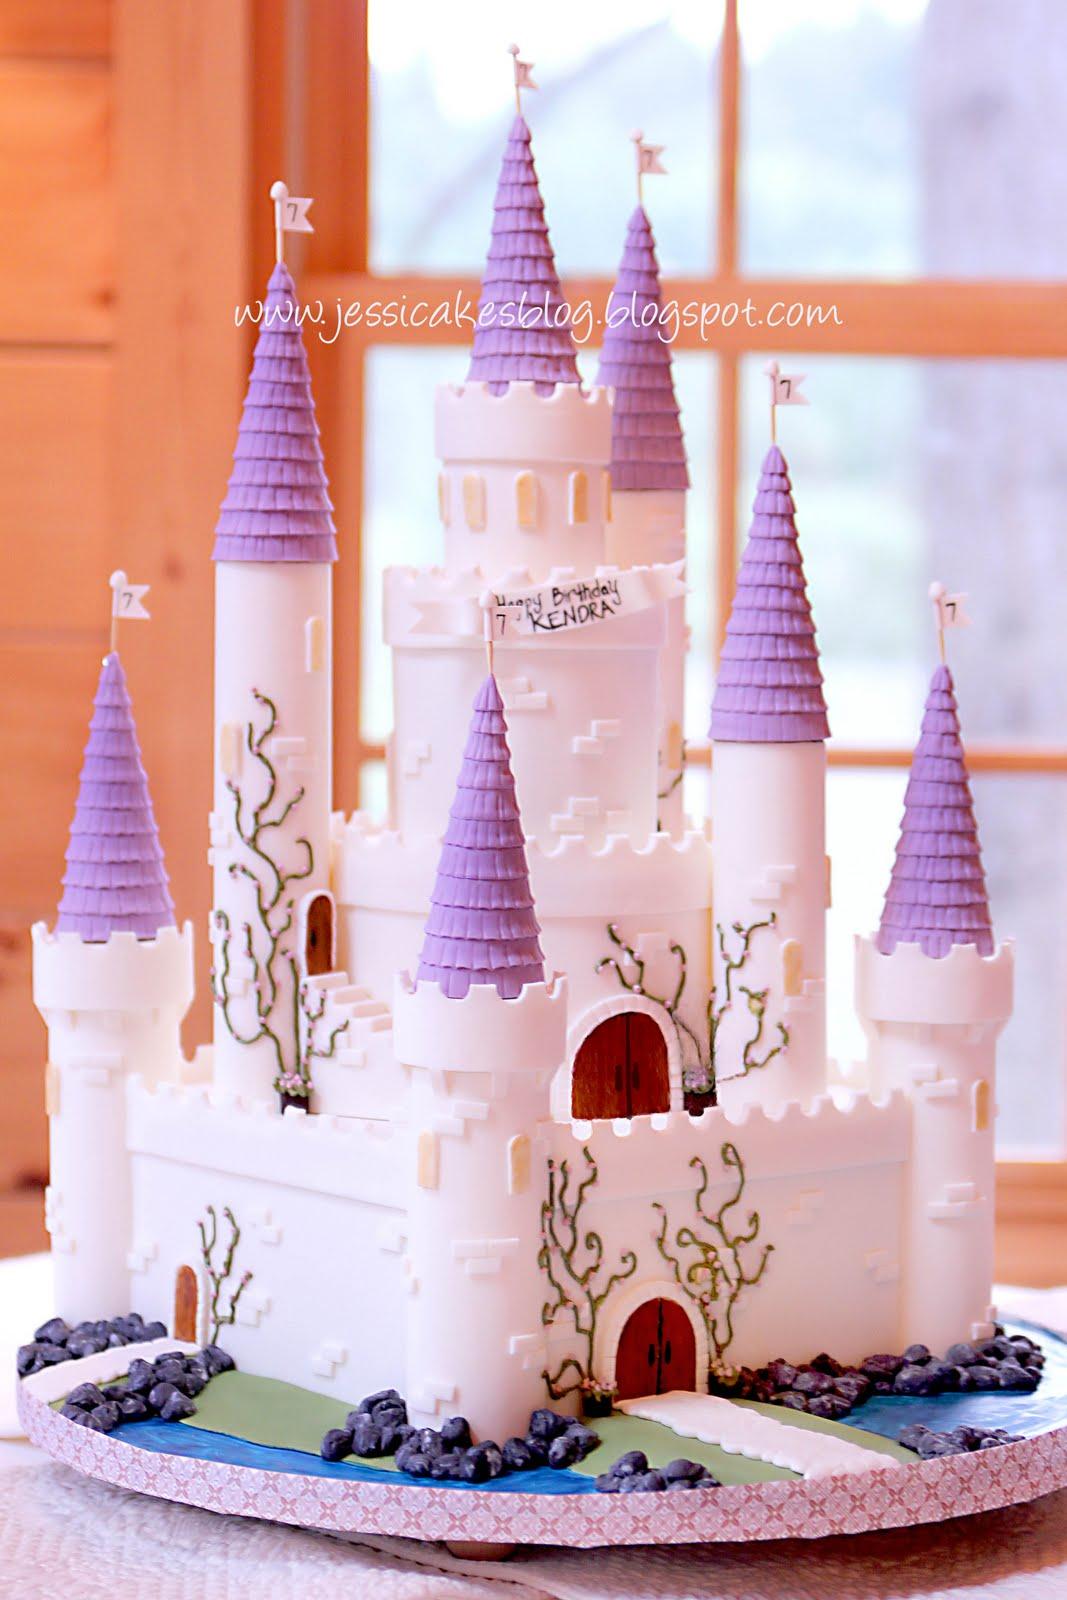 Pictures Of Princess Castle Cake : The Castle Cake - Jessica Harris Cake Design